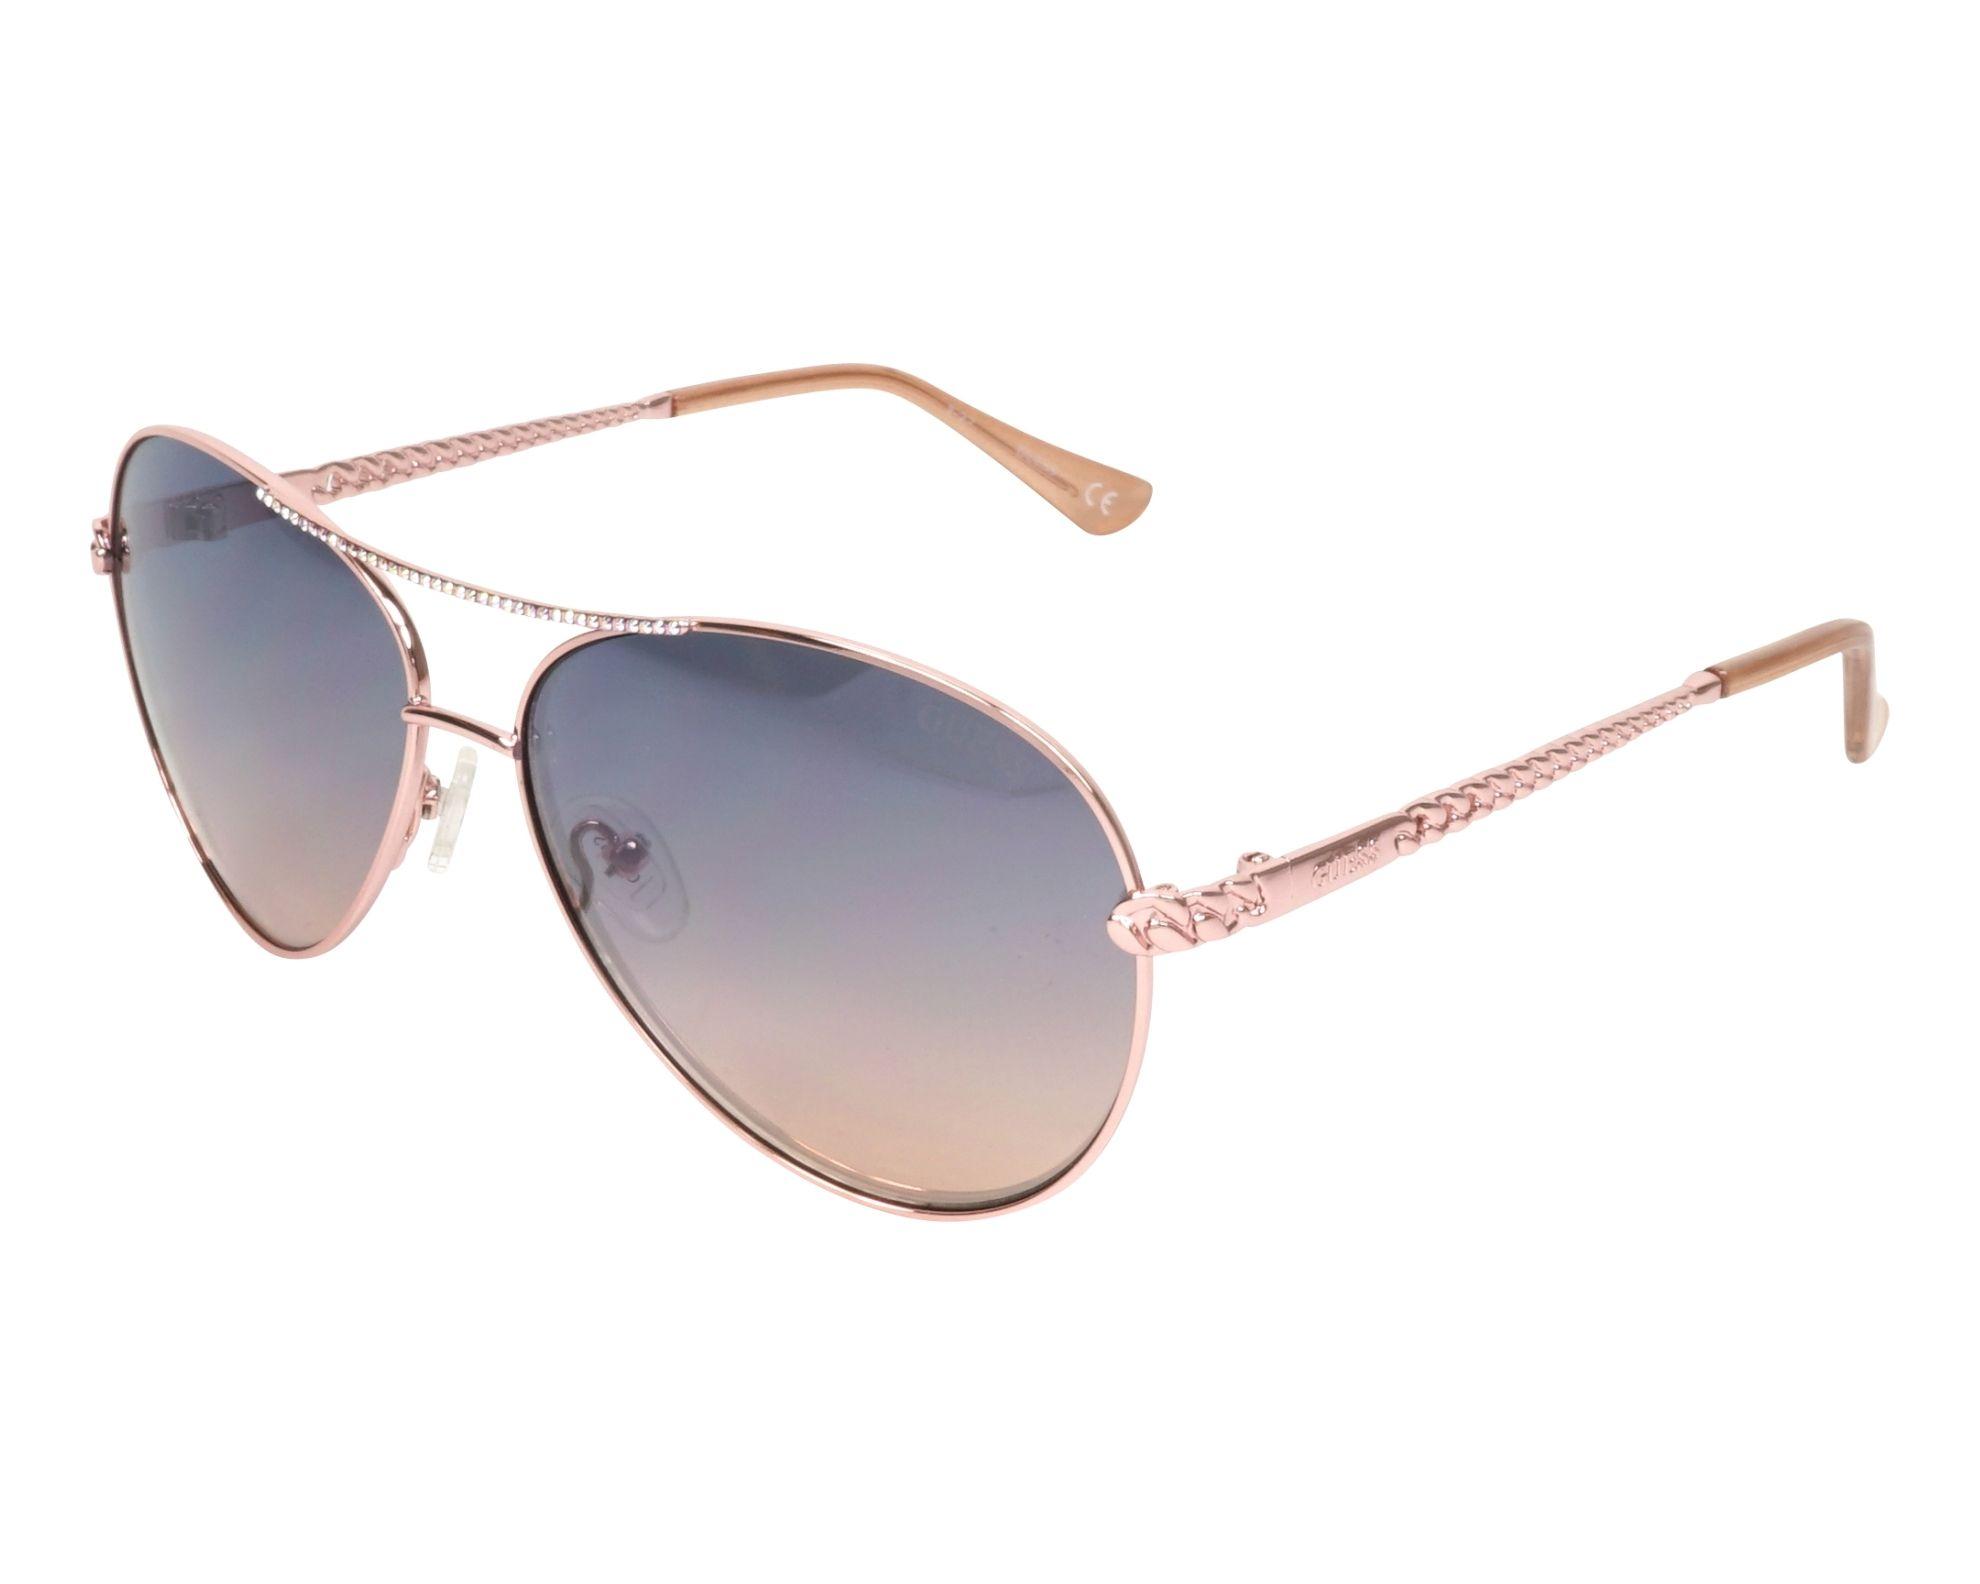 Guess Sonnenbrille Verspiegelt